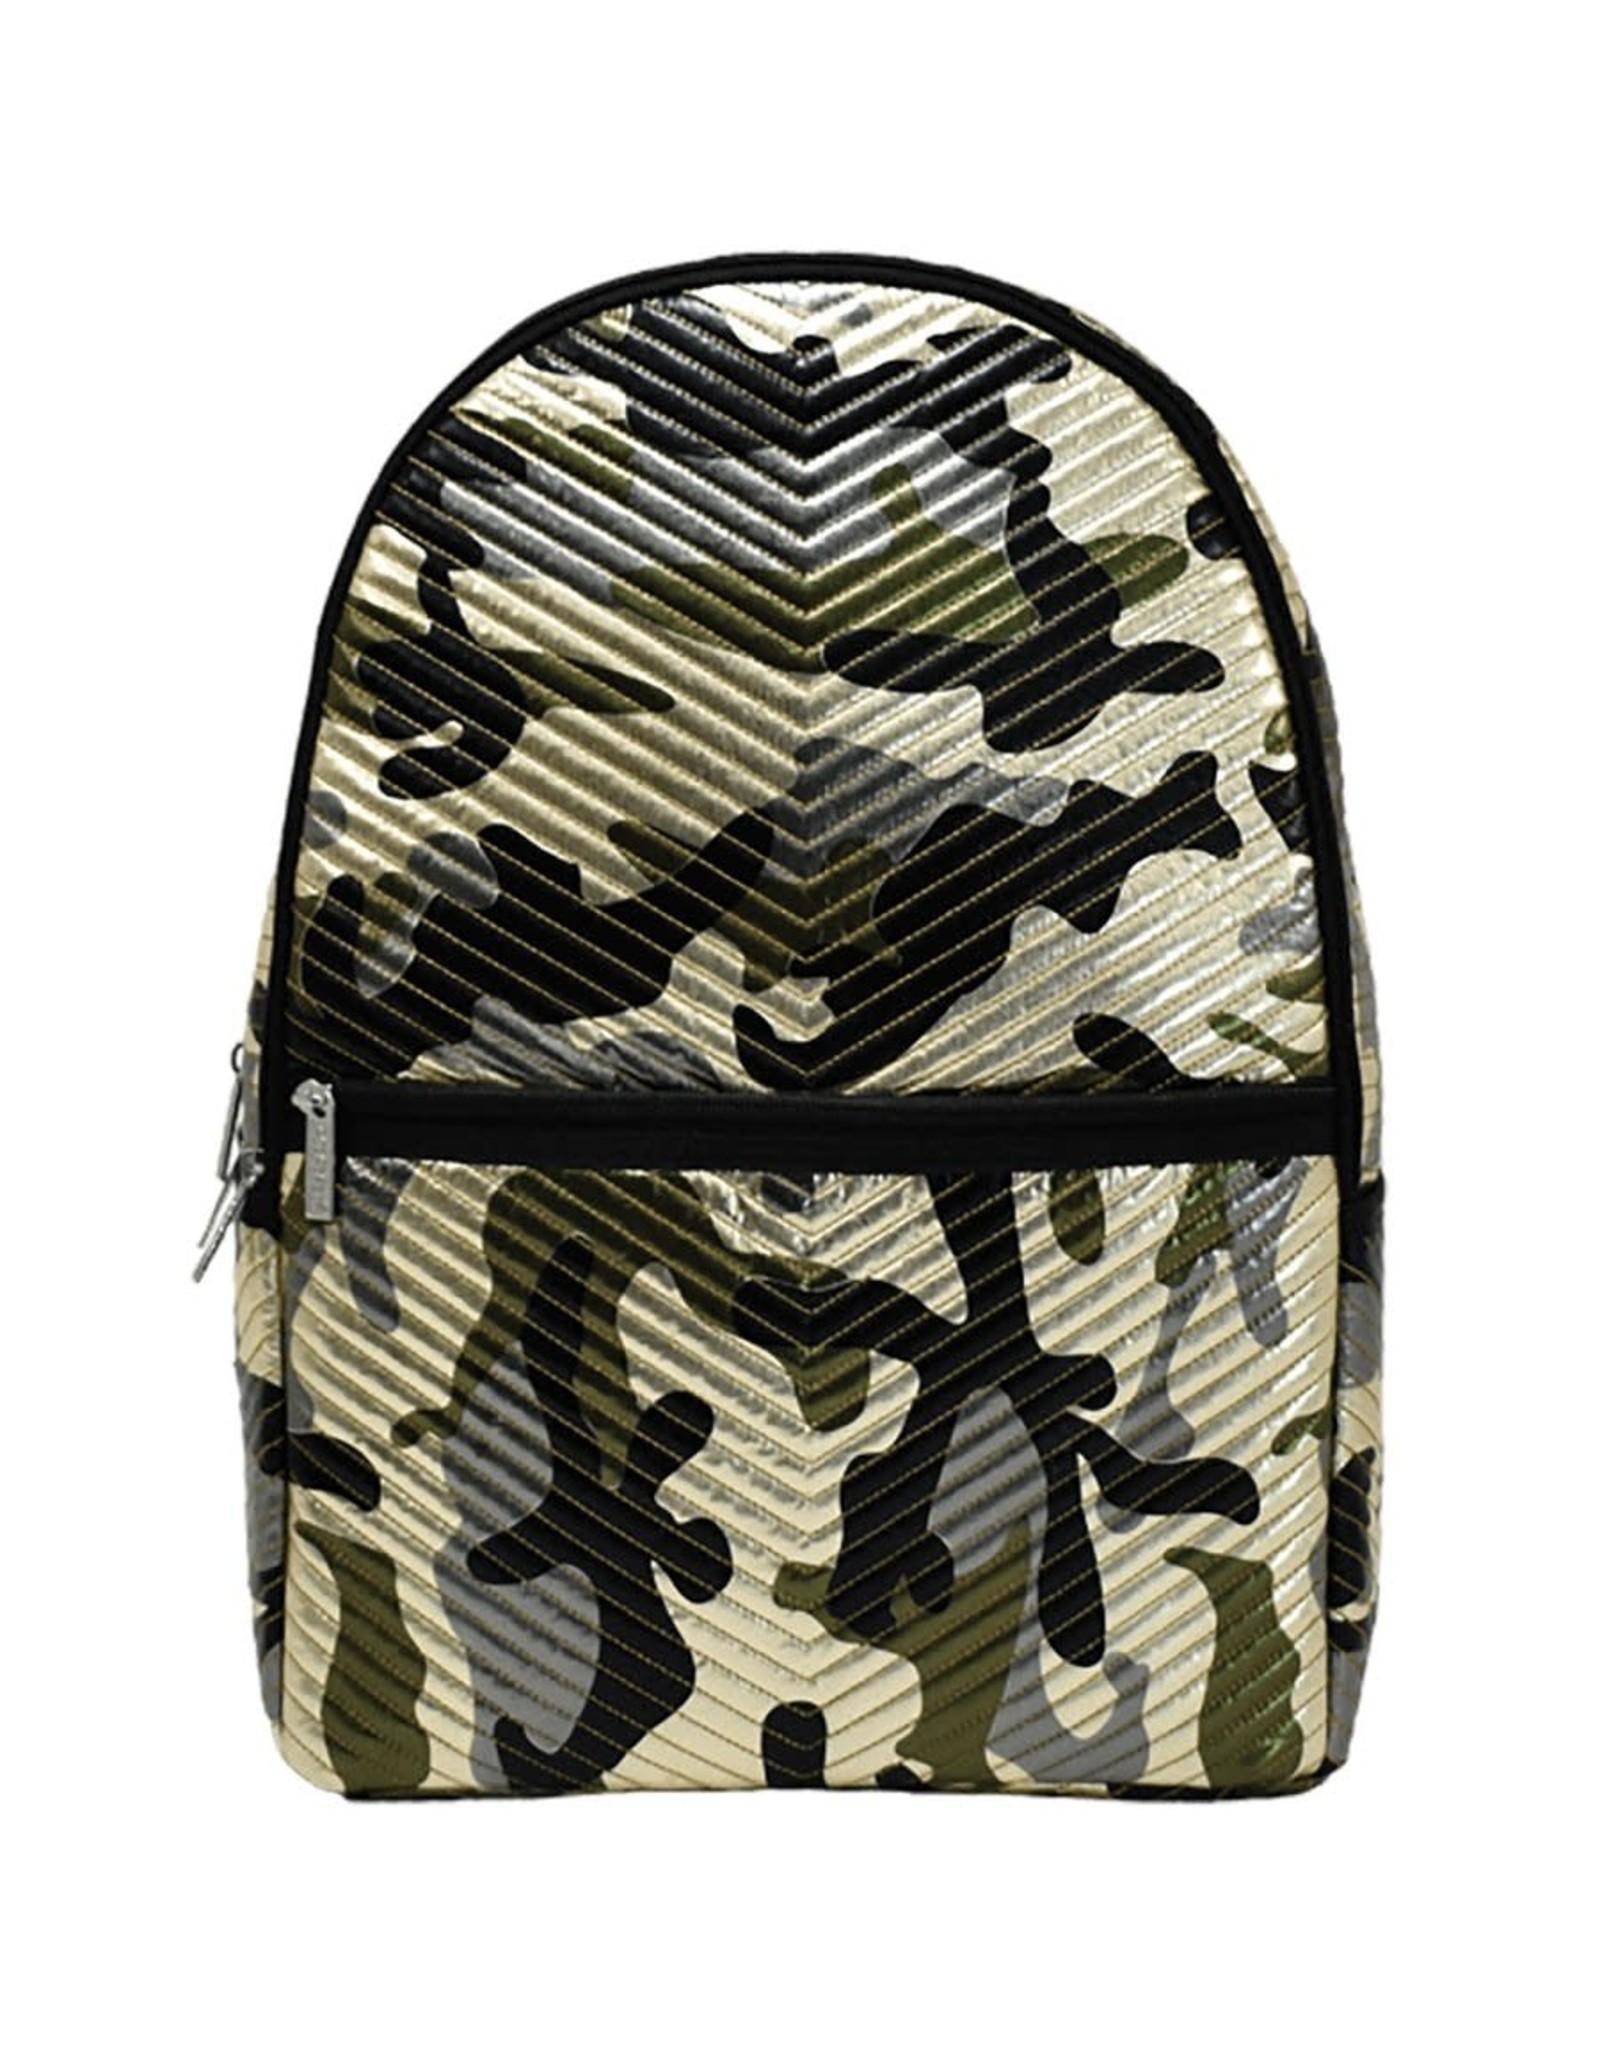 Iscream Backpack, Metallic Camo Chevron